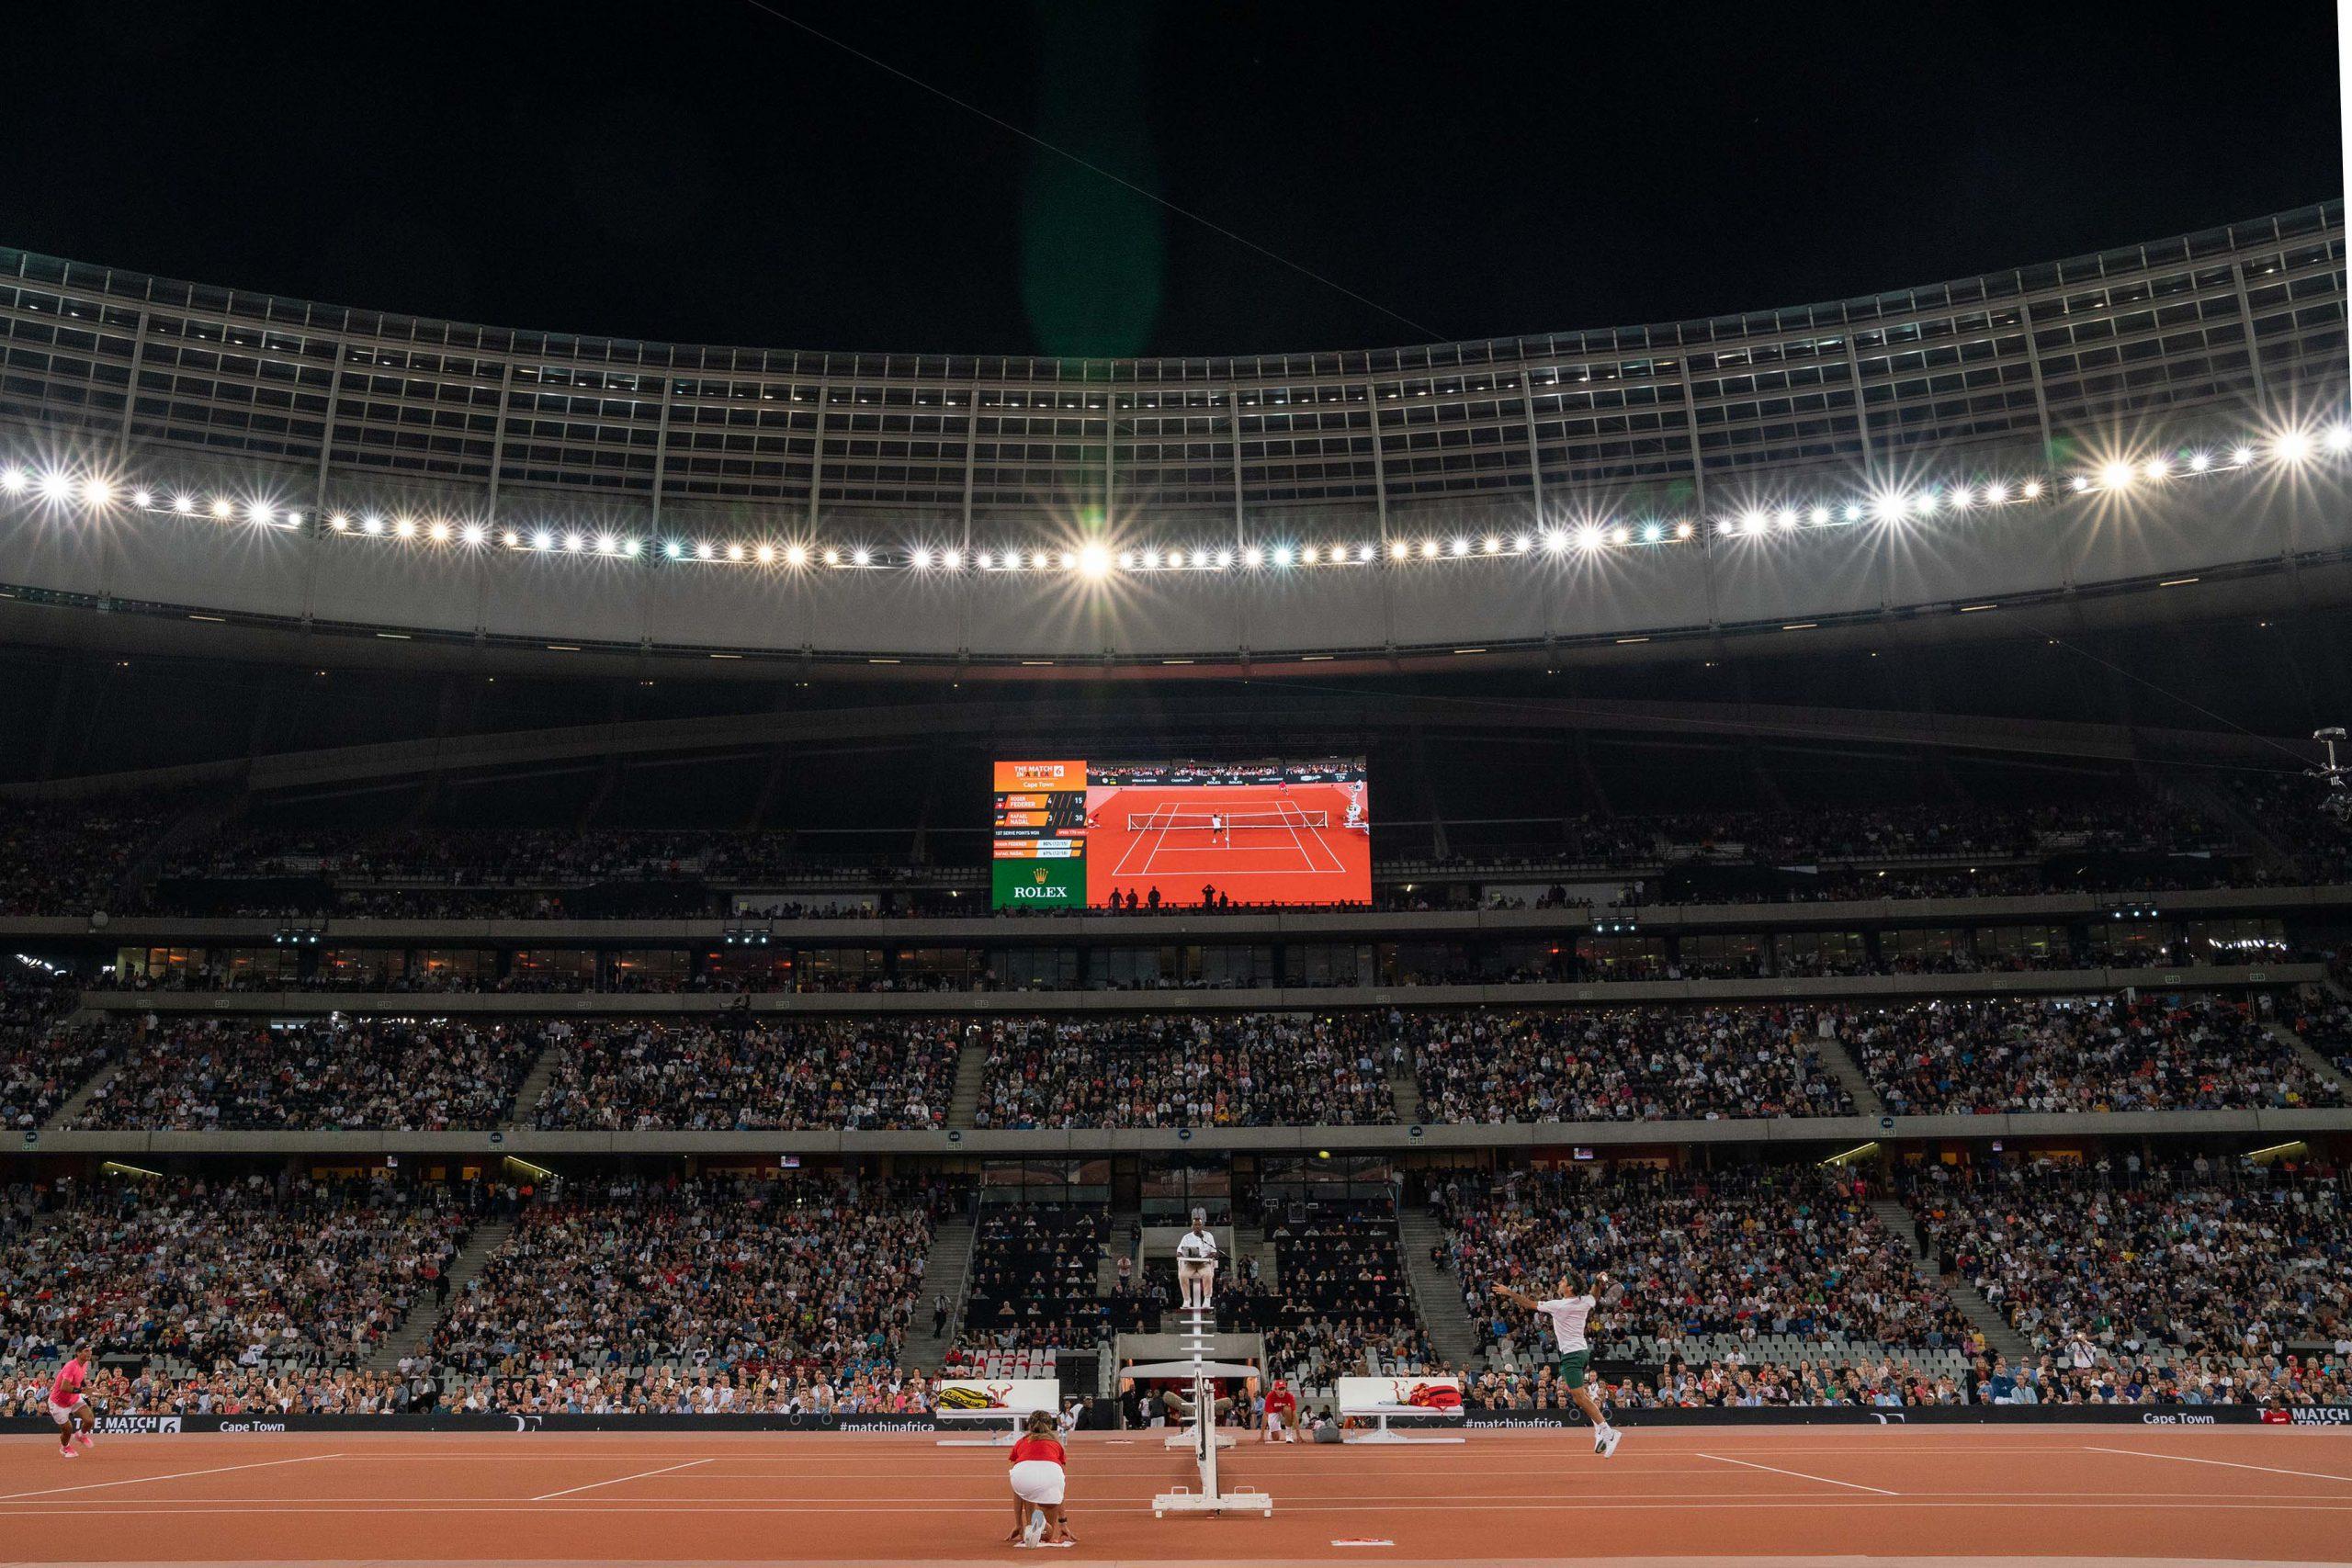 7 February 2020: Roger Federer beat Rafael Nadal in three sets.